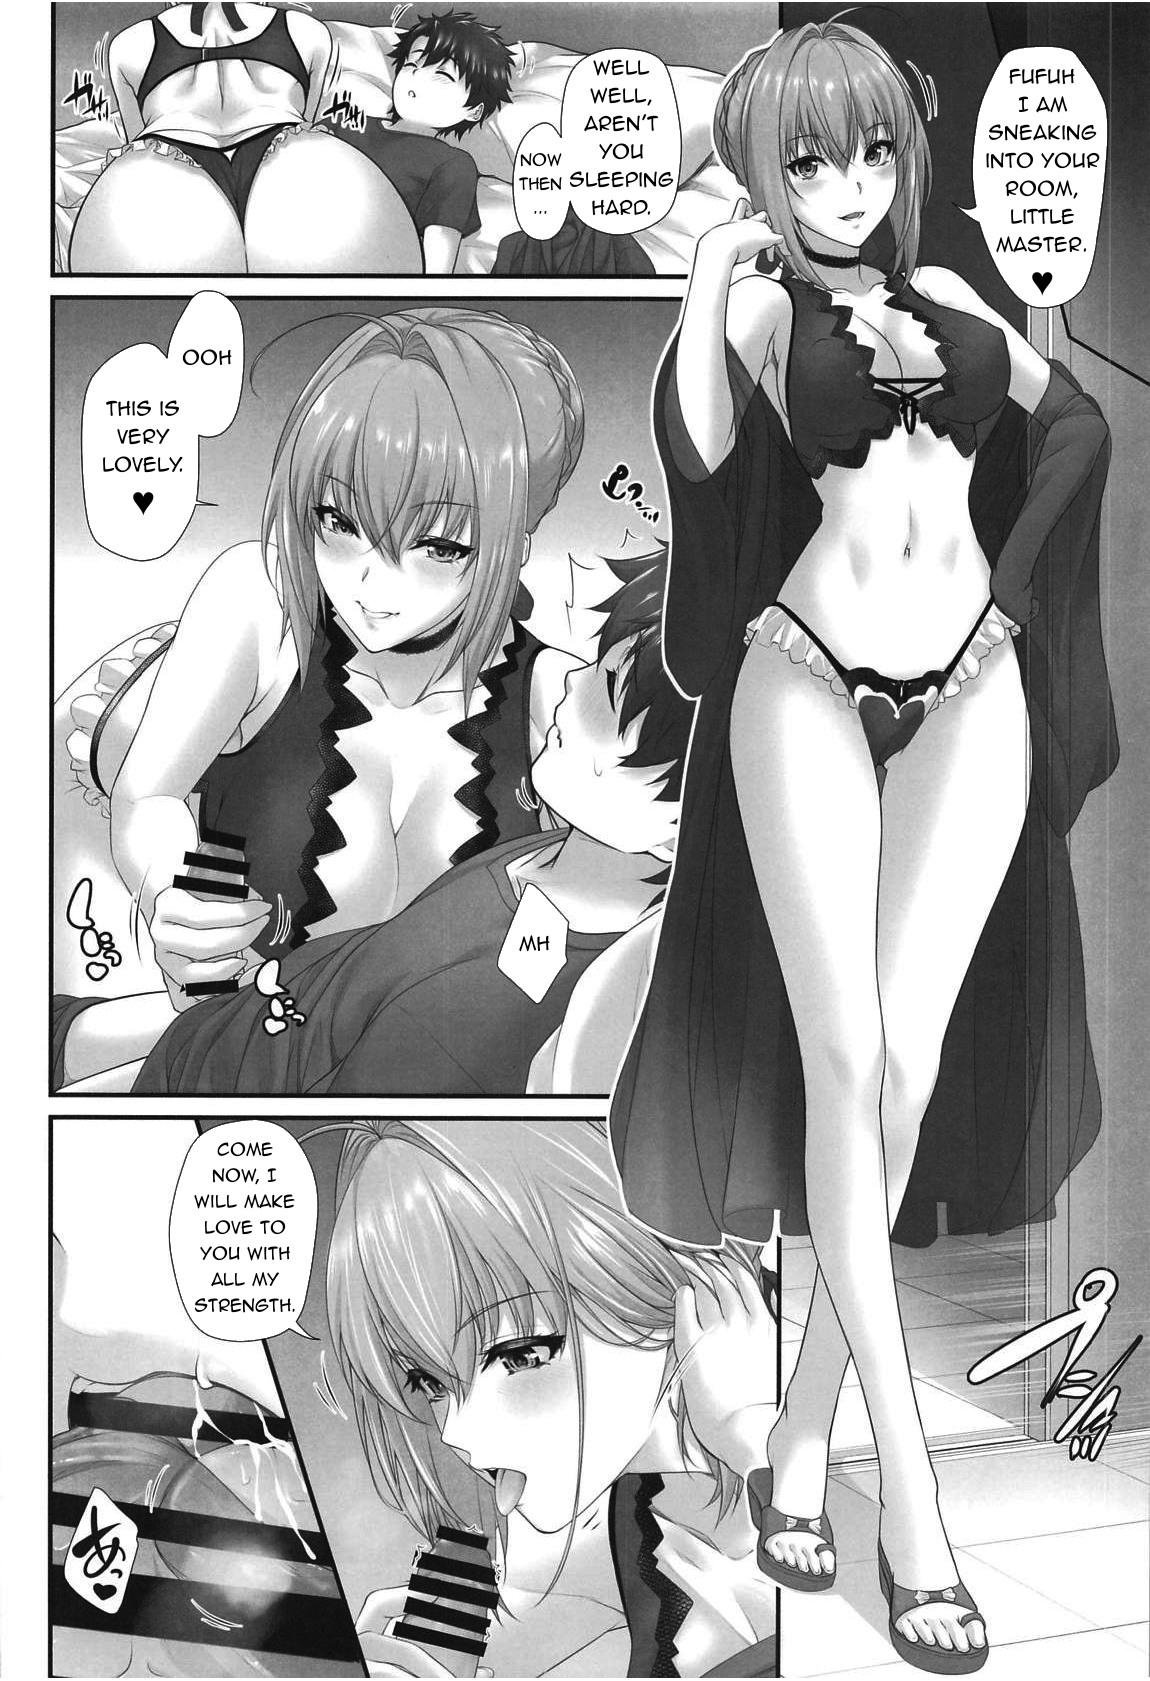 (C95) [Z.A.P. (Zucchini)] Ritsuka-kun no Sainan? 2 ~Nerawareta Kohitsuji!?~ | Ritsuka-kun's Misfortune? 2 The Targeted Lamb!? (Fate/Grand Order) [English] [q91] 7